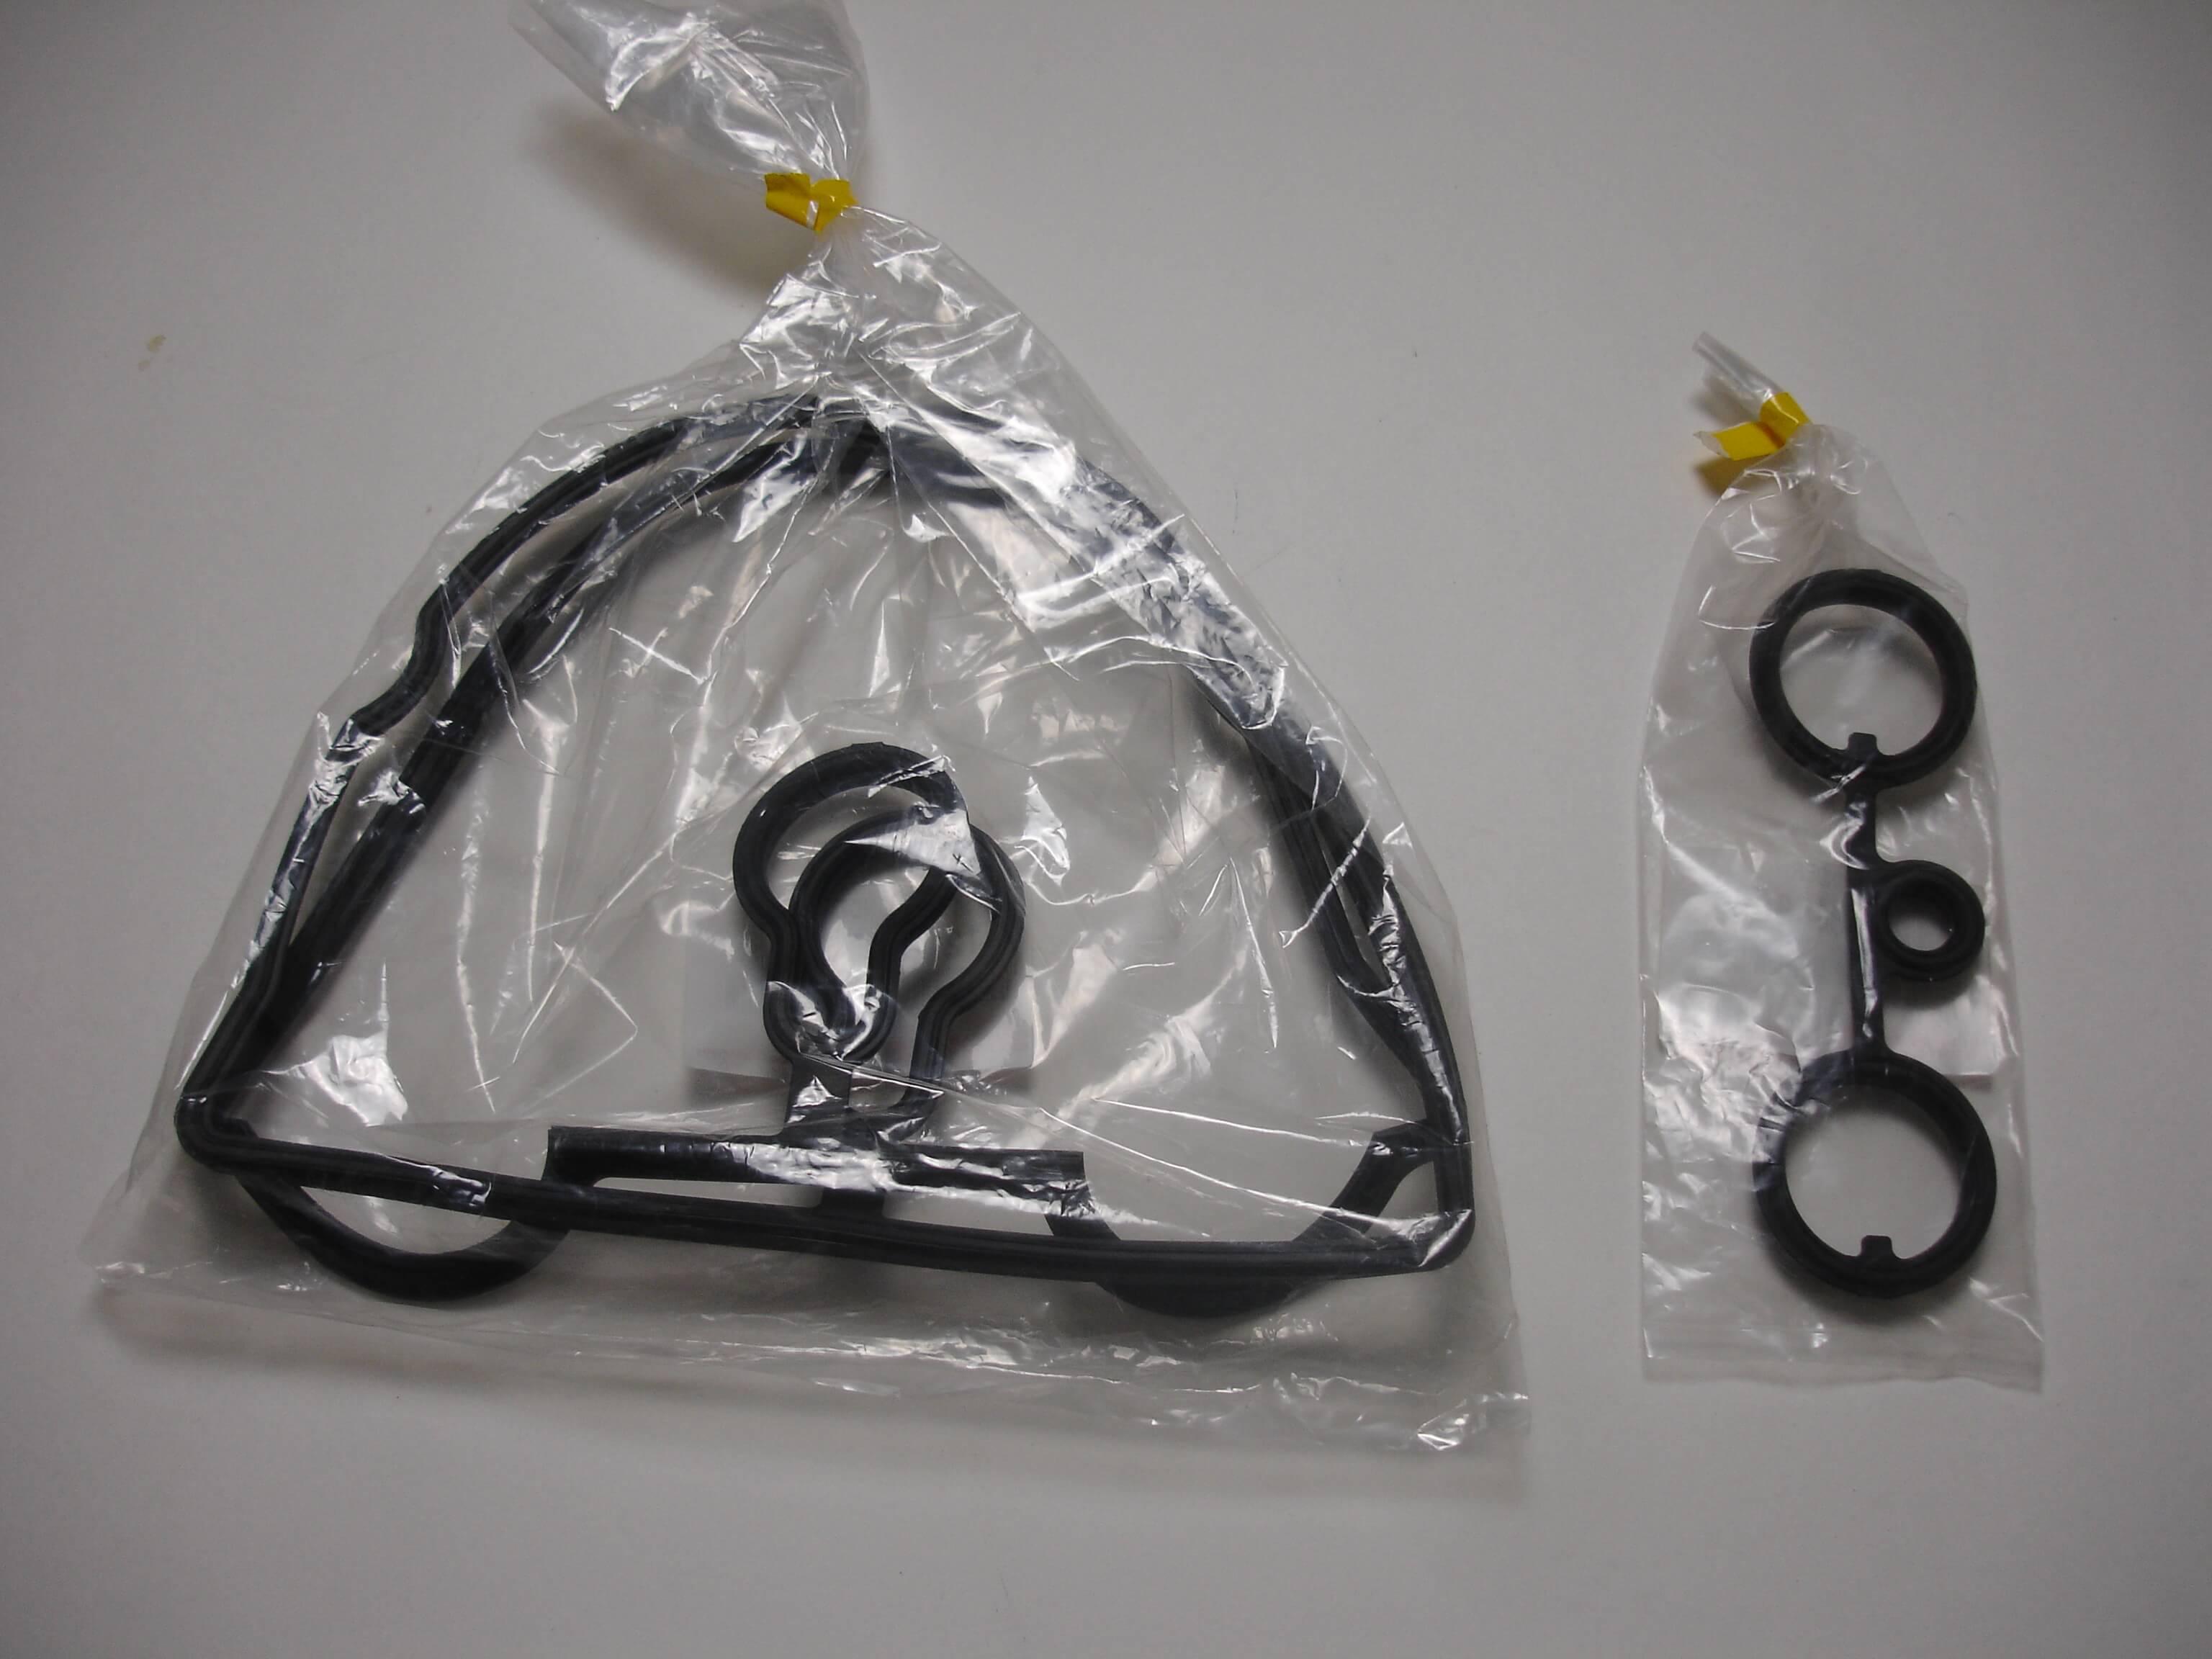 Toyota OEM 3S-GTE Gen 4 And 5 Valve Cover Gasket Set 11214-88580 11213-88580